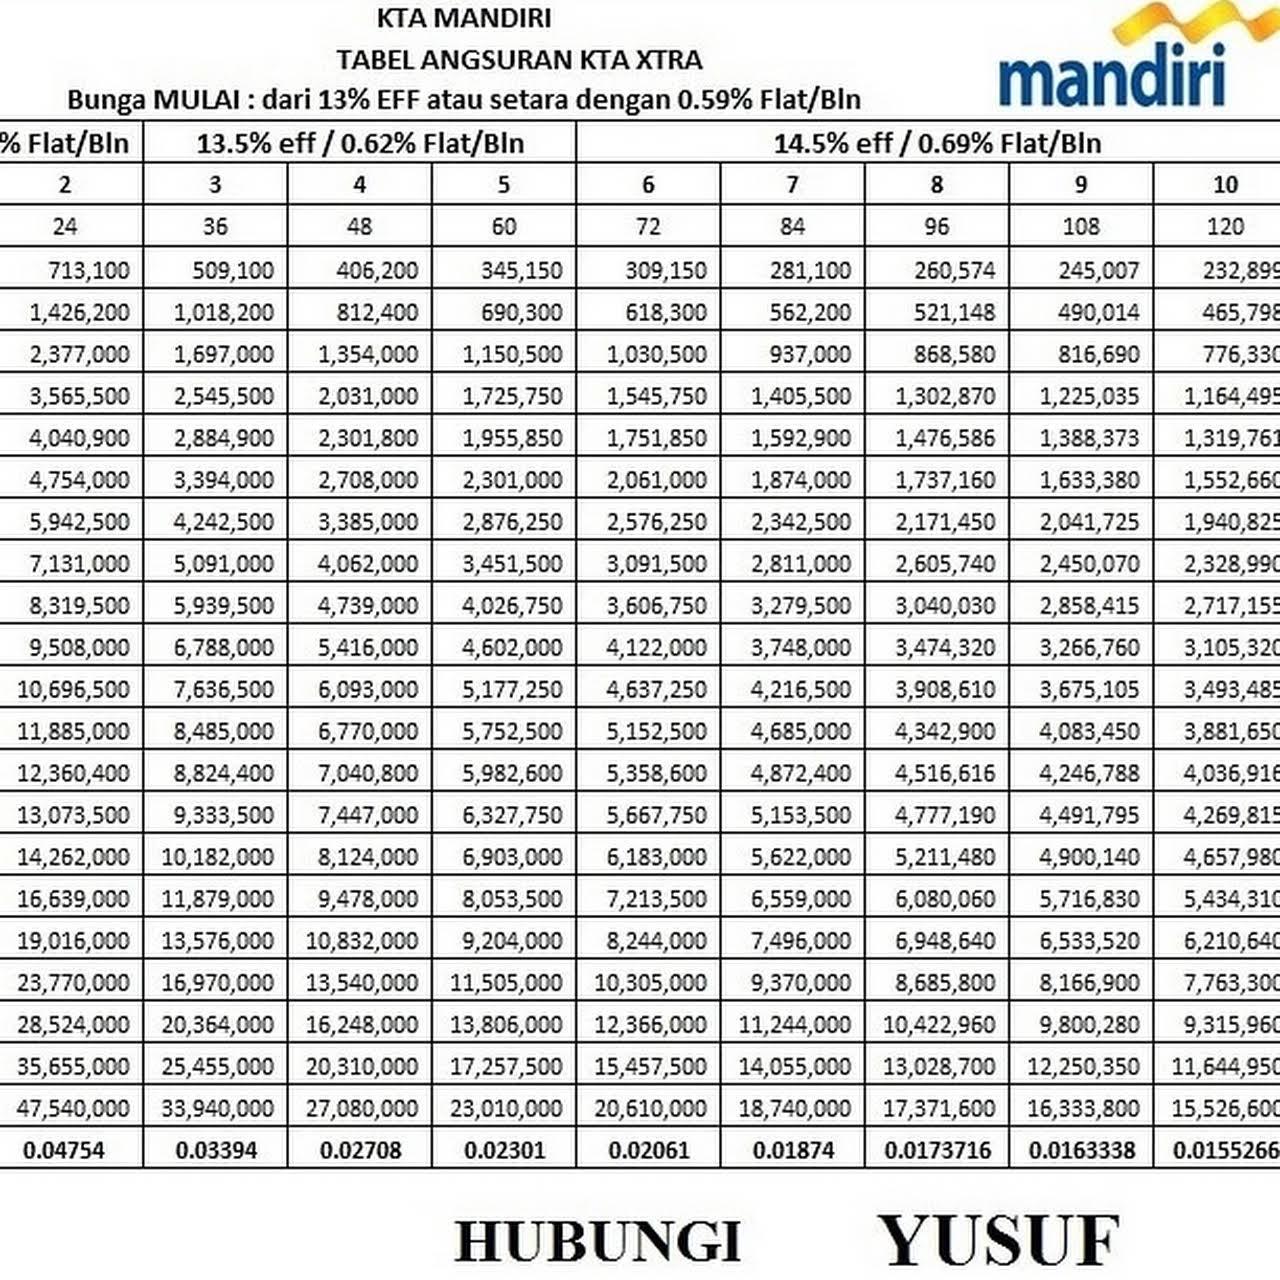 Sales Kta Mandiri Bank